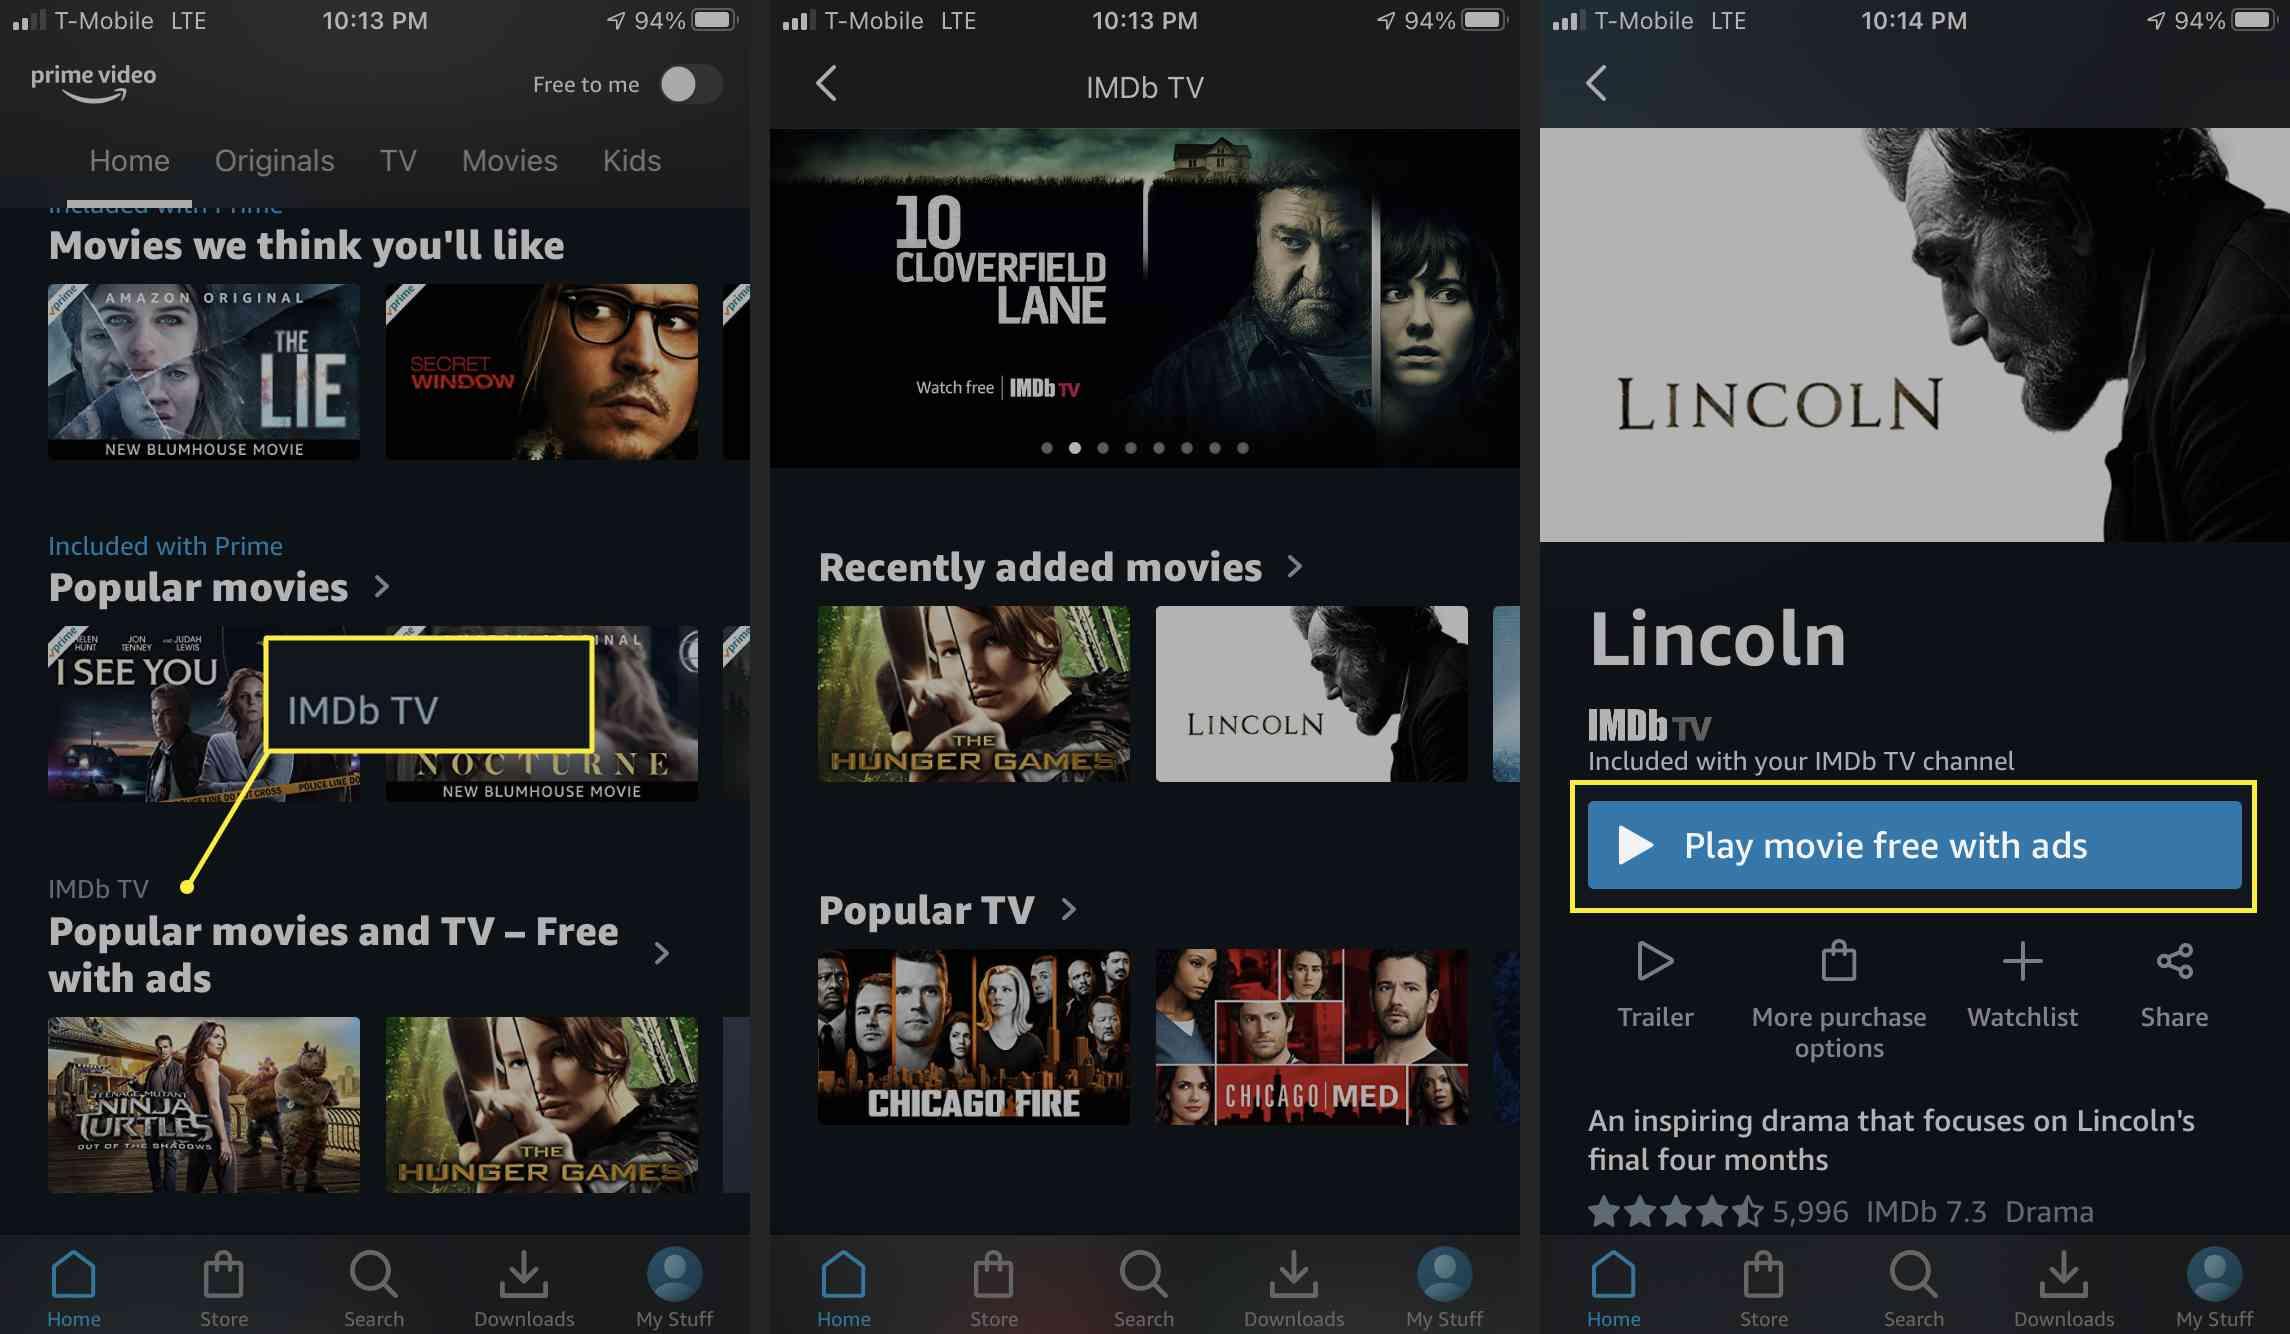 Watching IMDb TV movie on mobile